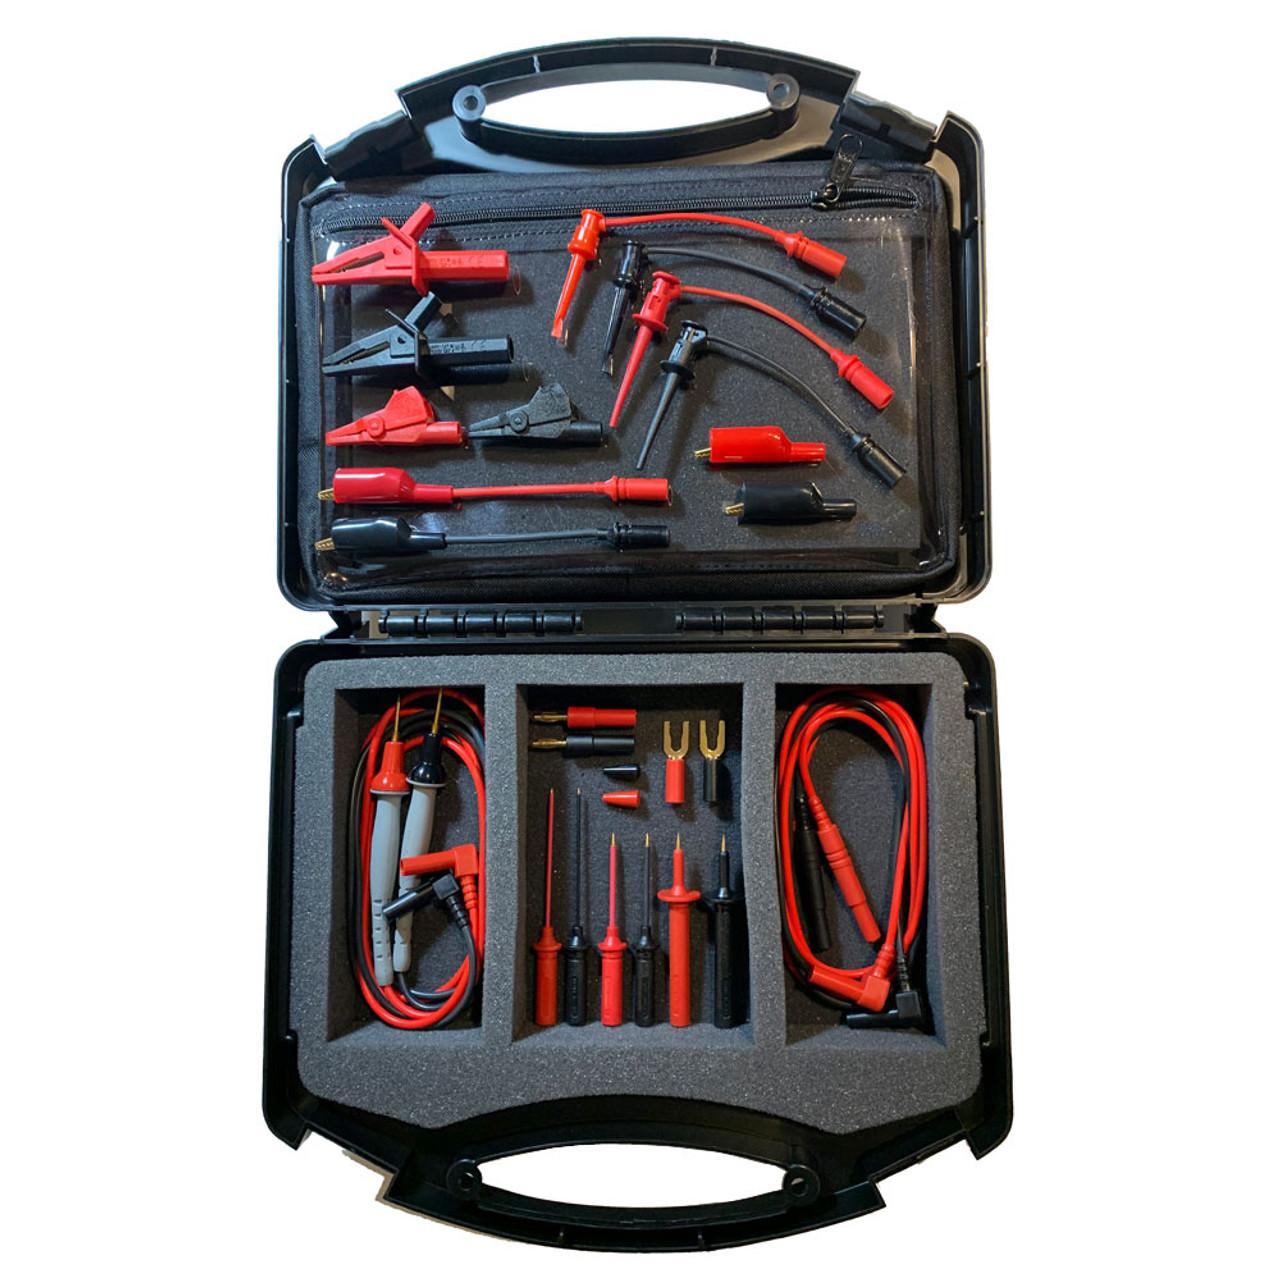 9117 Test Lead Combo Kit